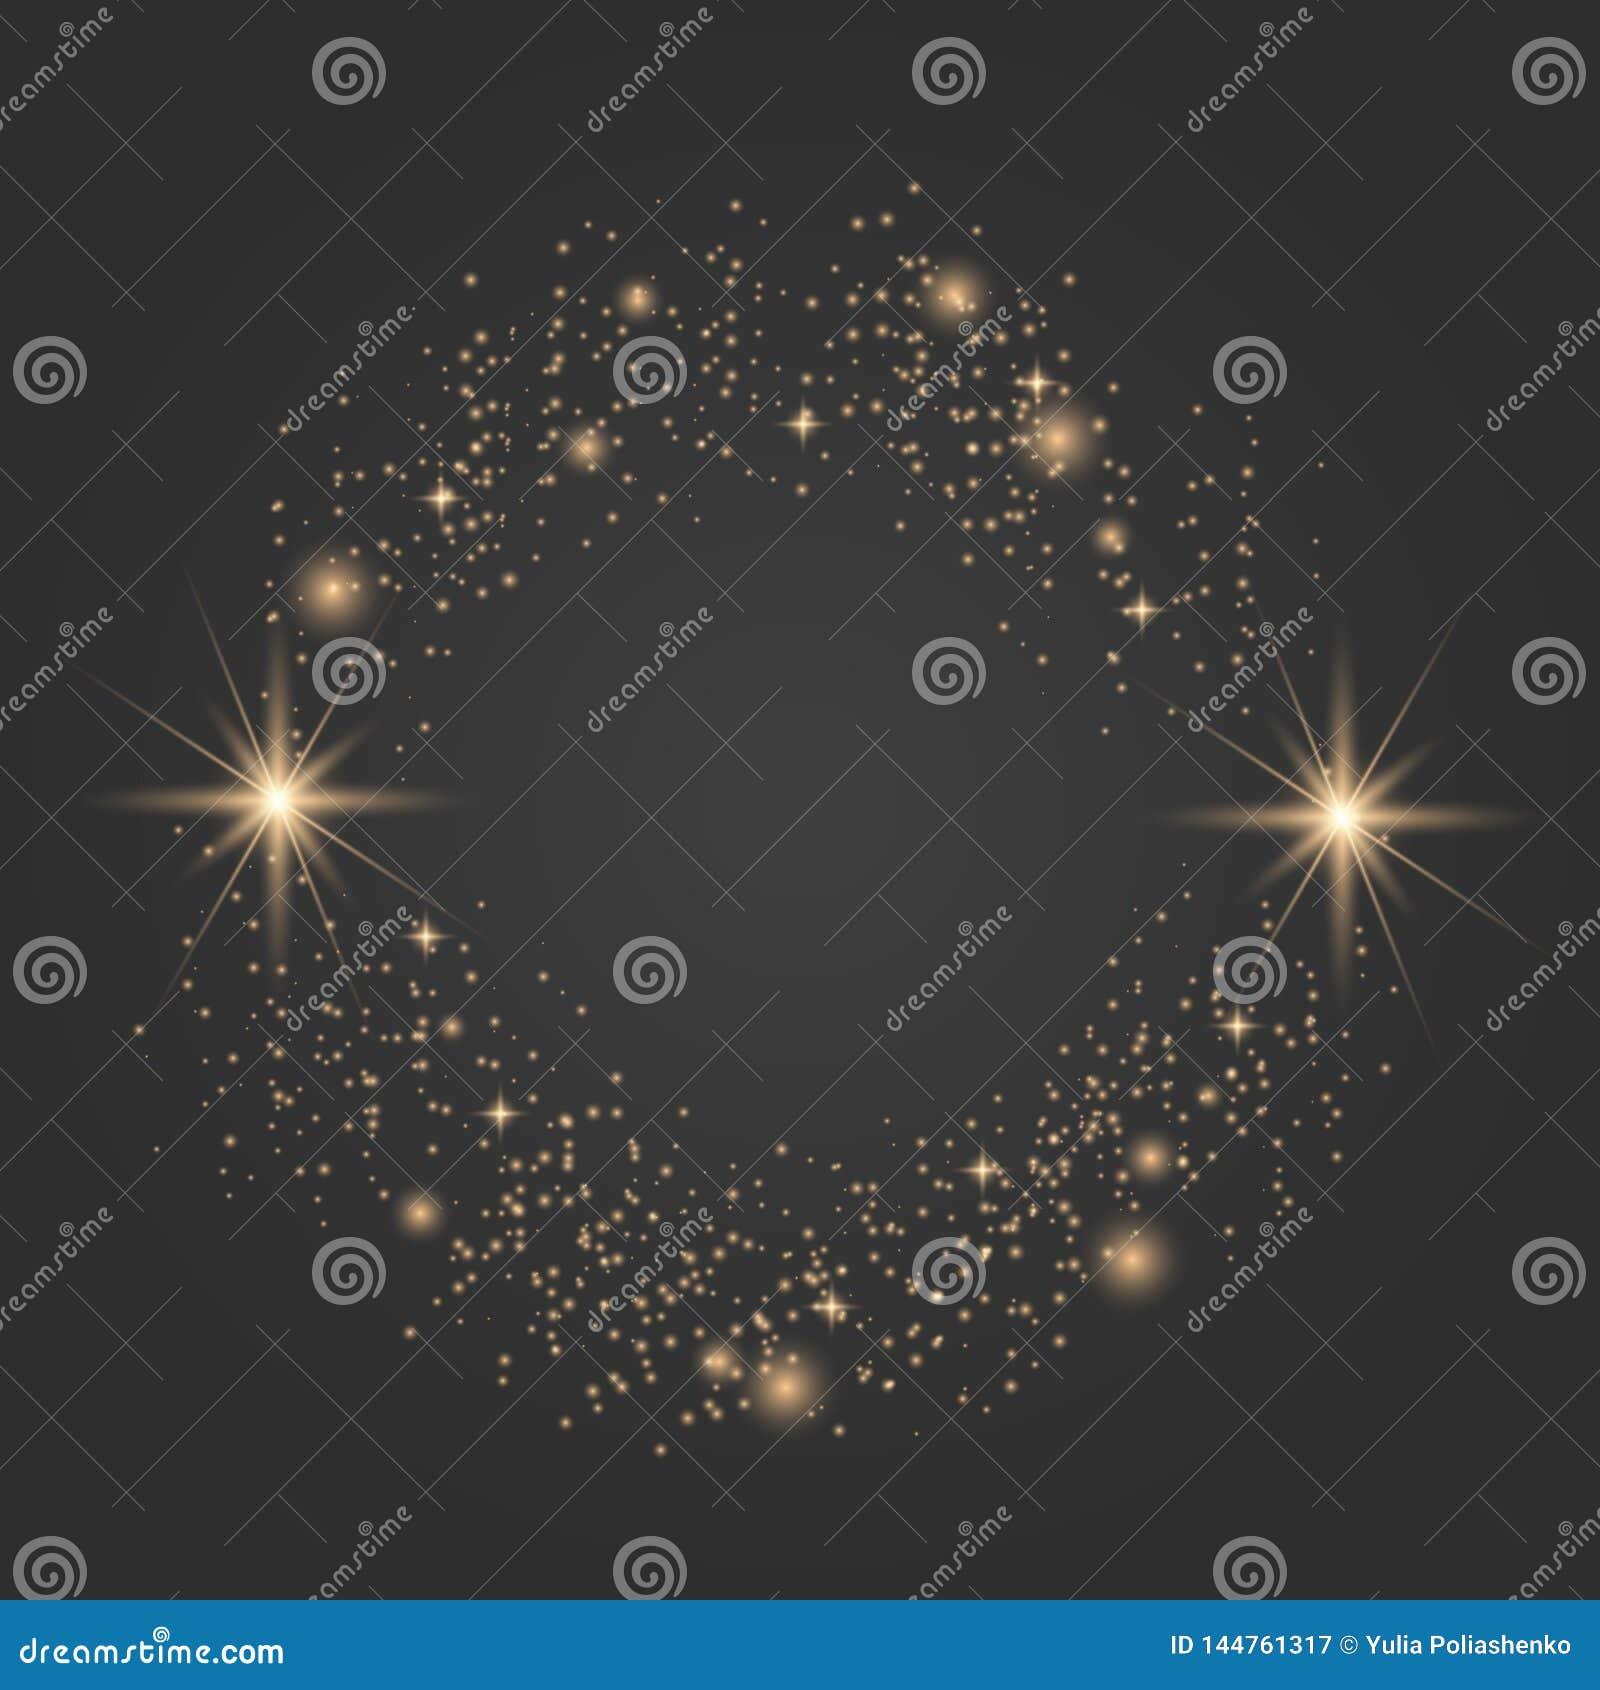 Vector sparkles on transparent background.